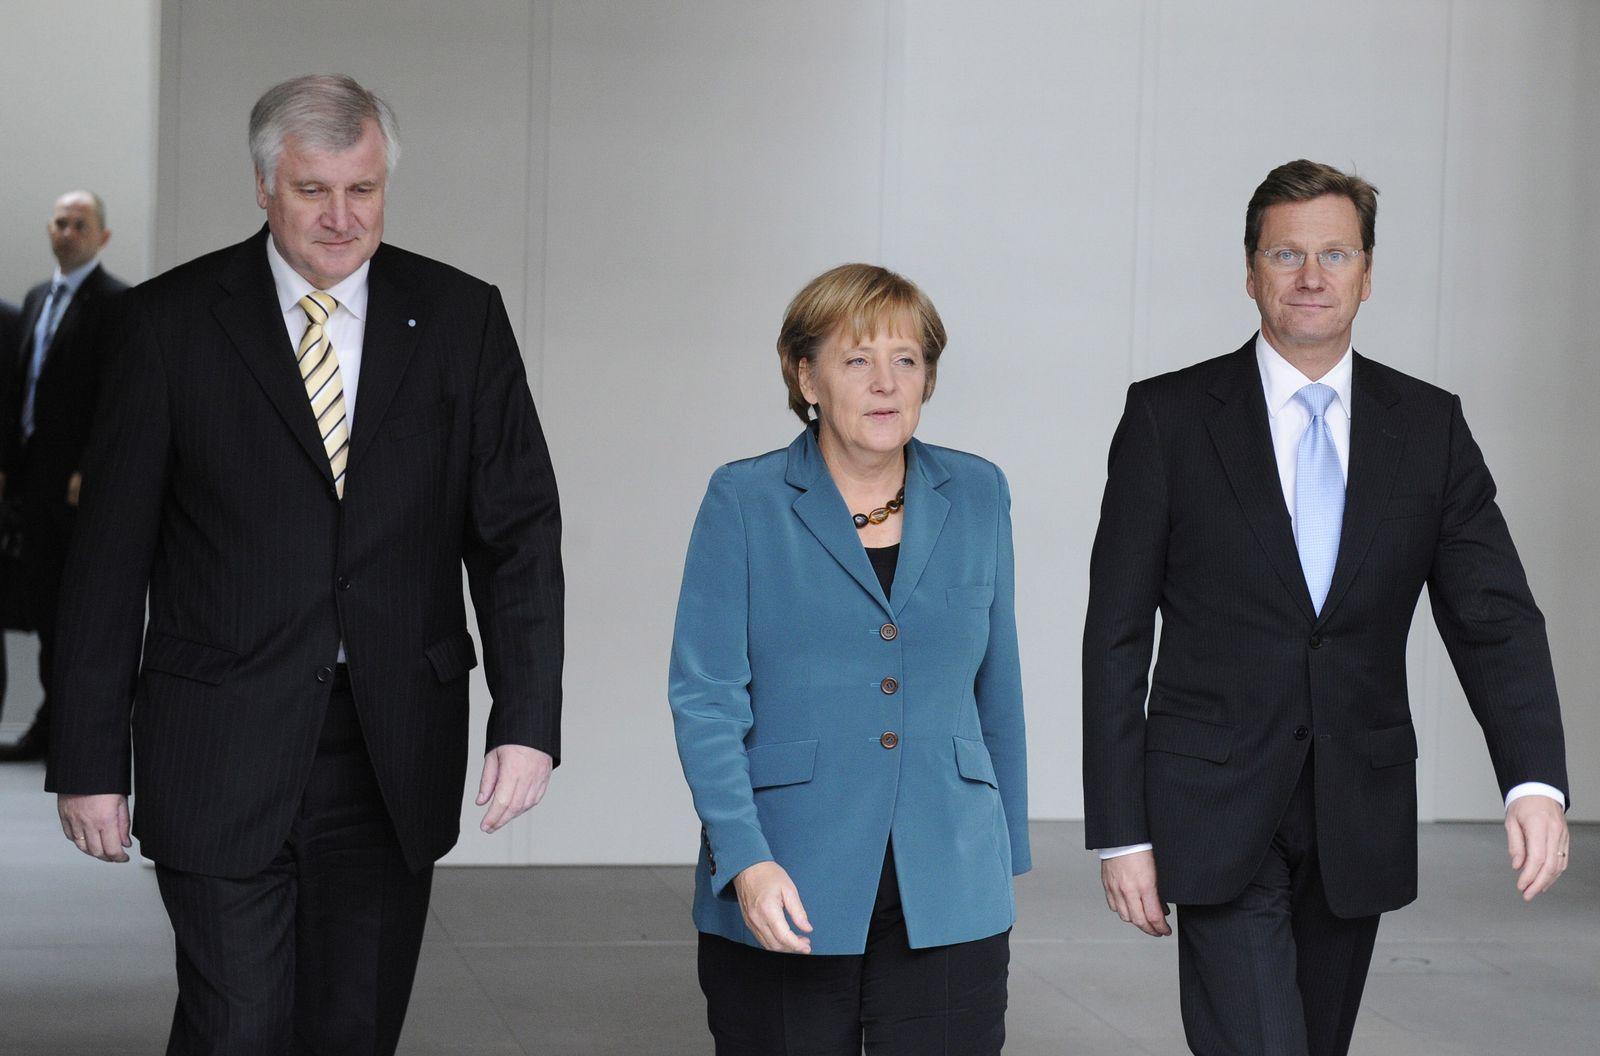 Seehofer, Merkel, Westerwelle